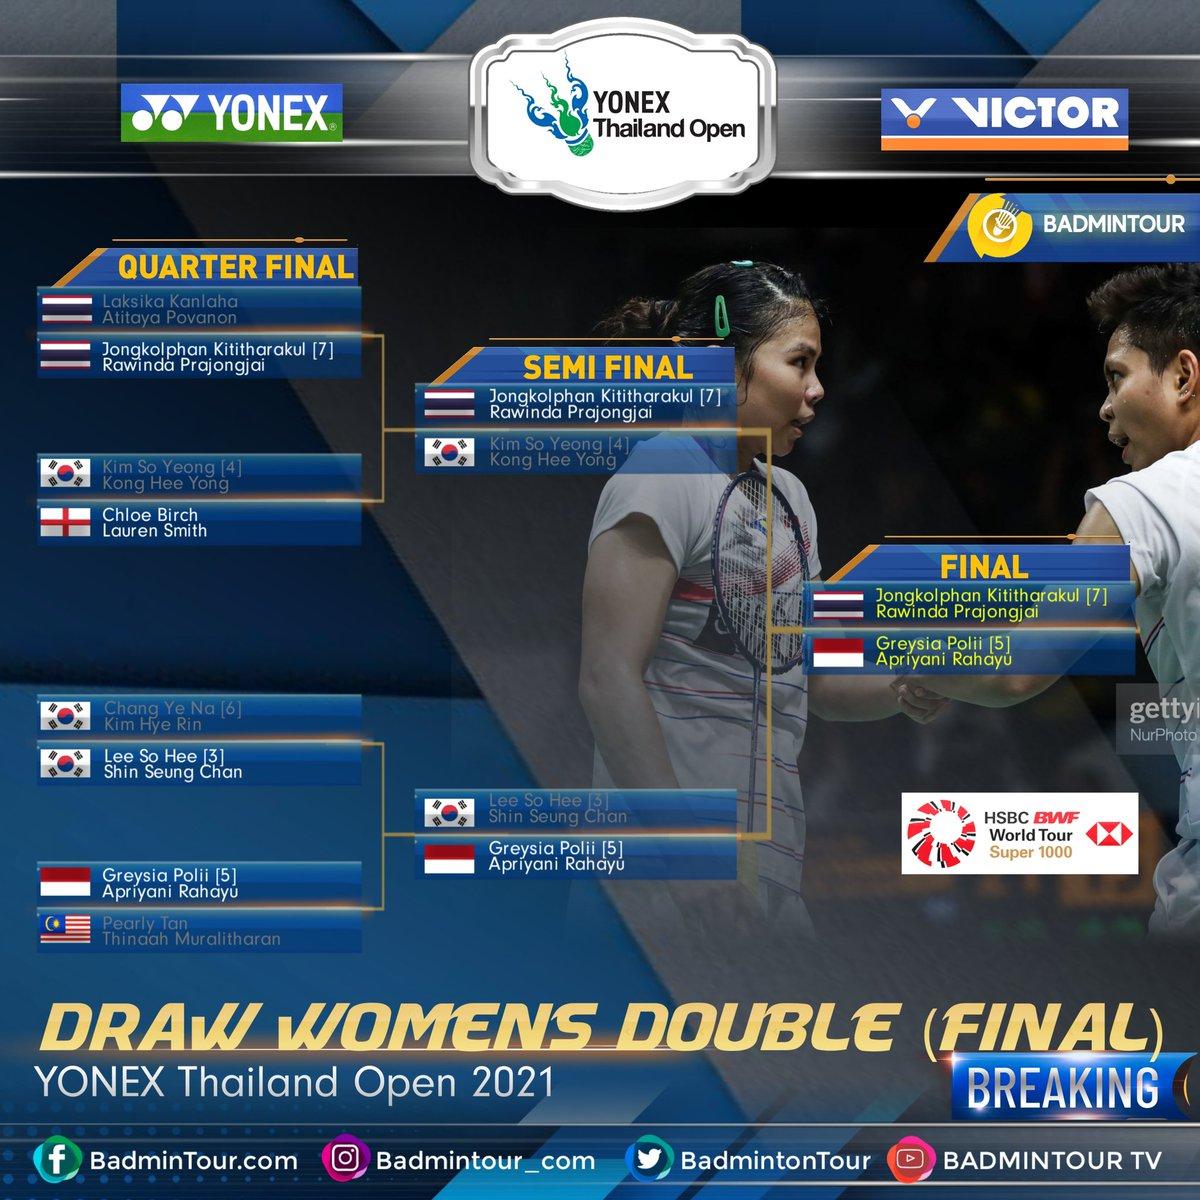 BREAKINGGGG😍😍😍 #YonexThailandOpen  Here Are LIST DRAWING ( FINAL) (Womens Double) YONEX Thailand Open 2021 (HSBC BWF World Tour Super 1000) . .  Bagaimana nih prediksi kalian?? . #BWFWorldTour #badminton #badmintonindonesia https://t.co/JFv8tV0ss6